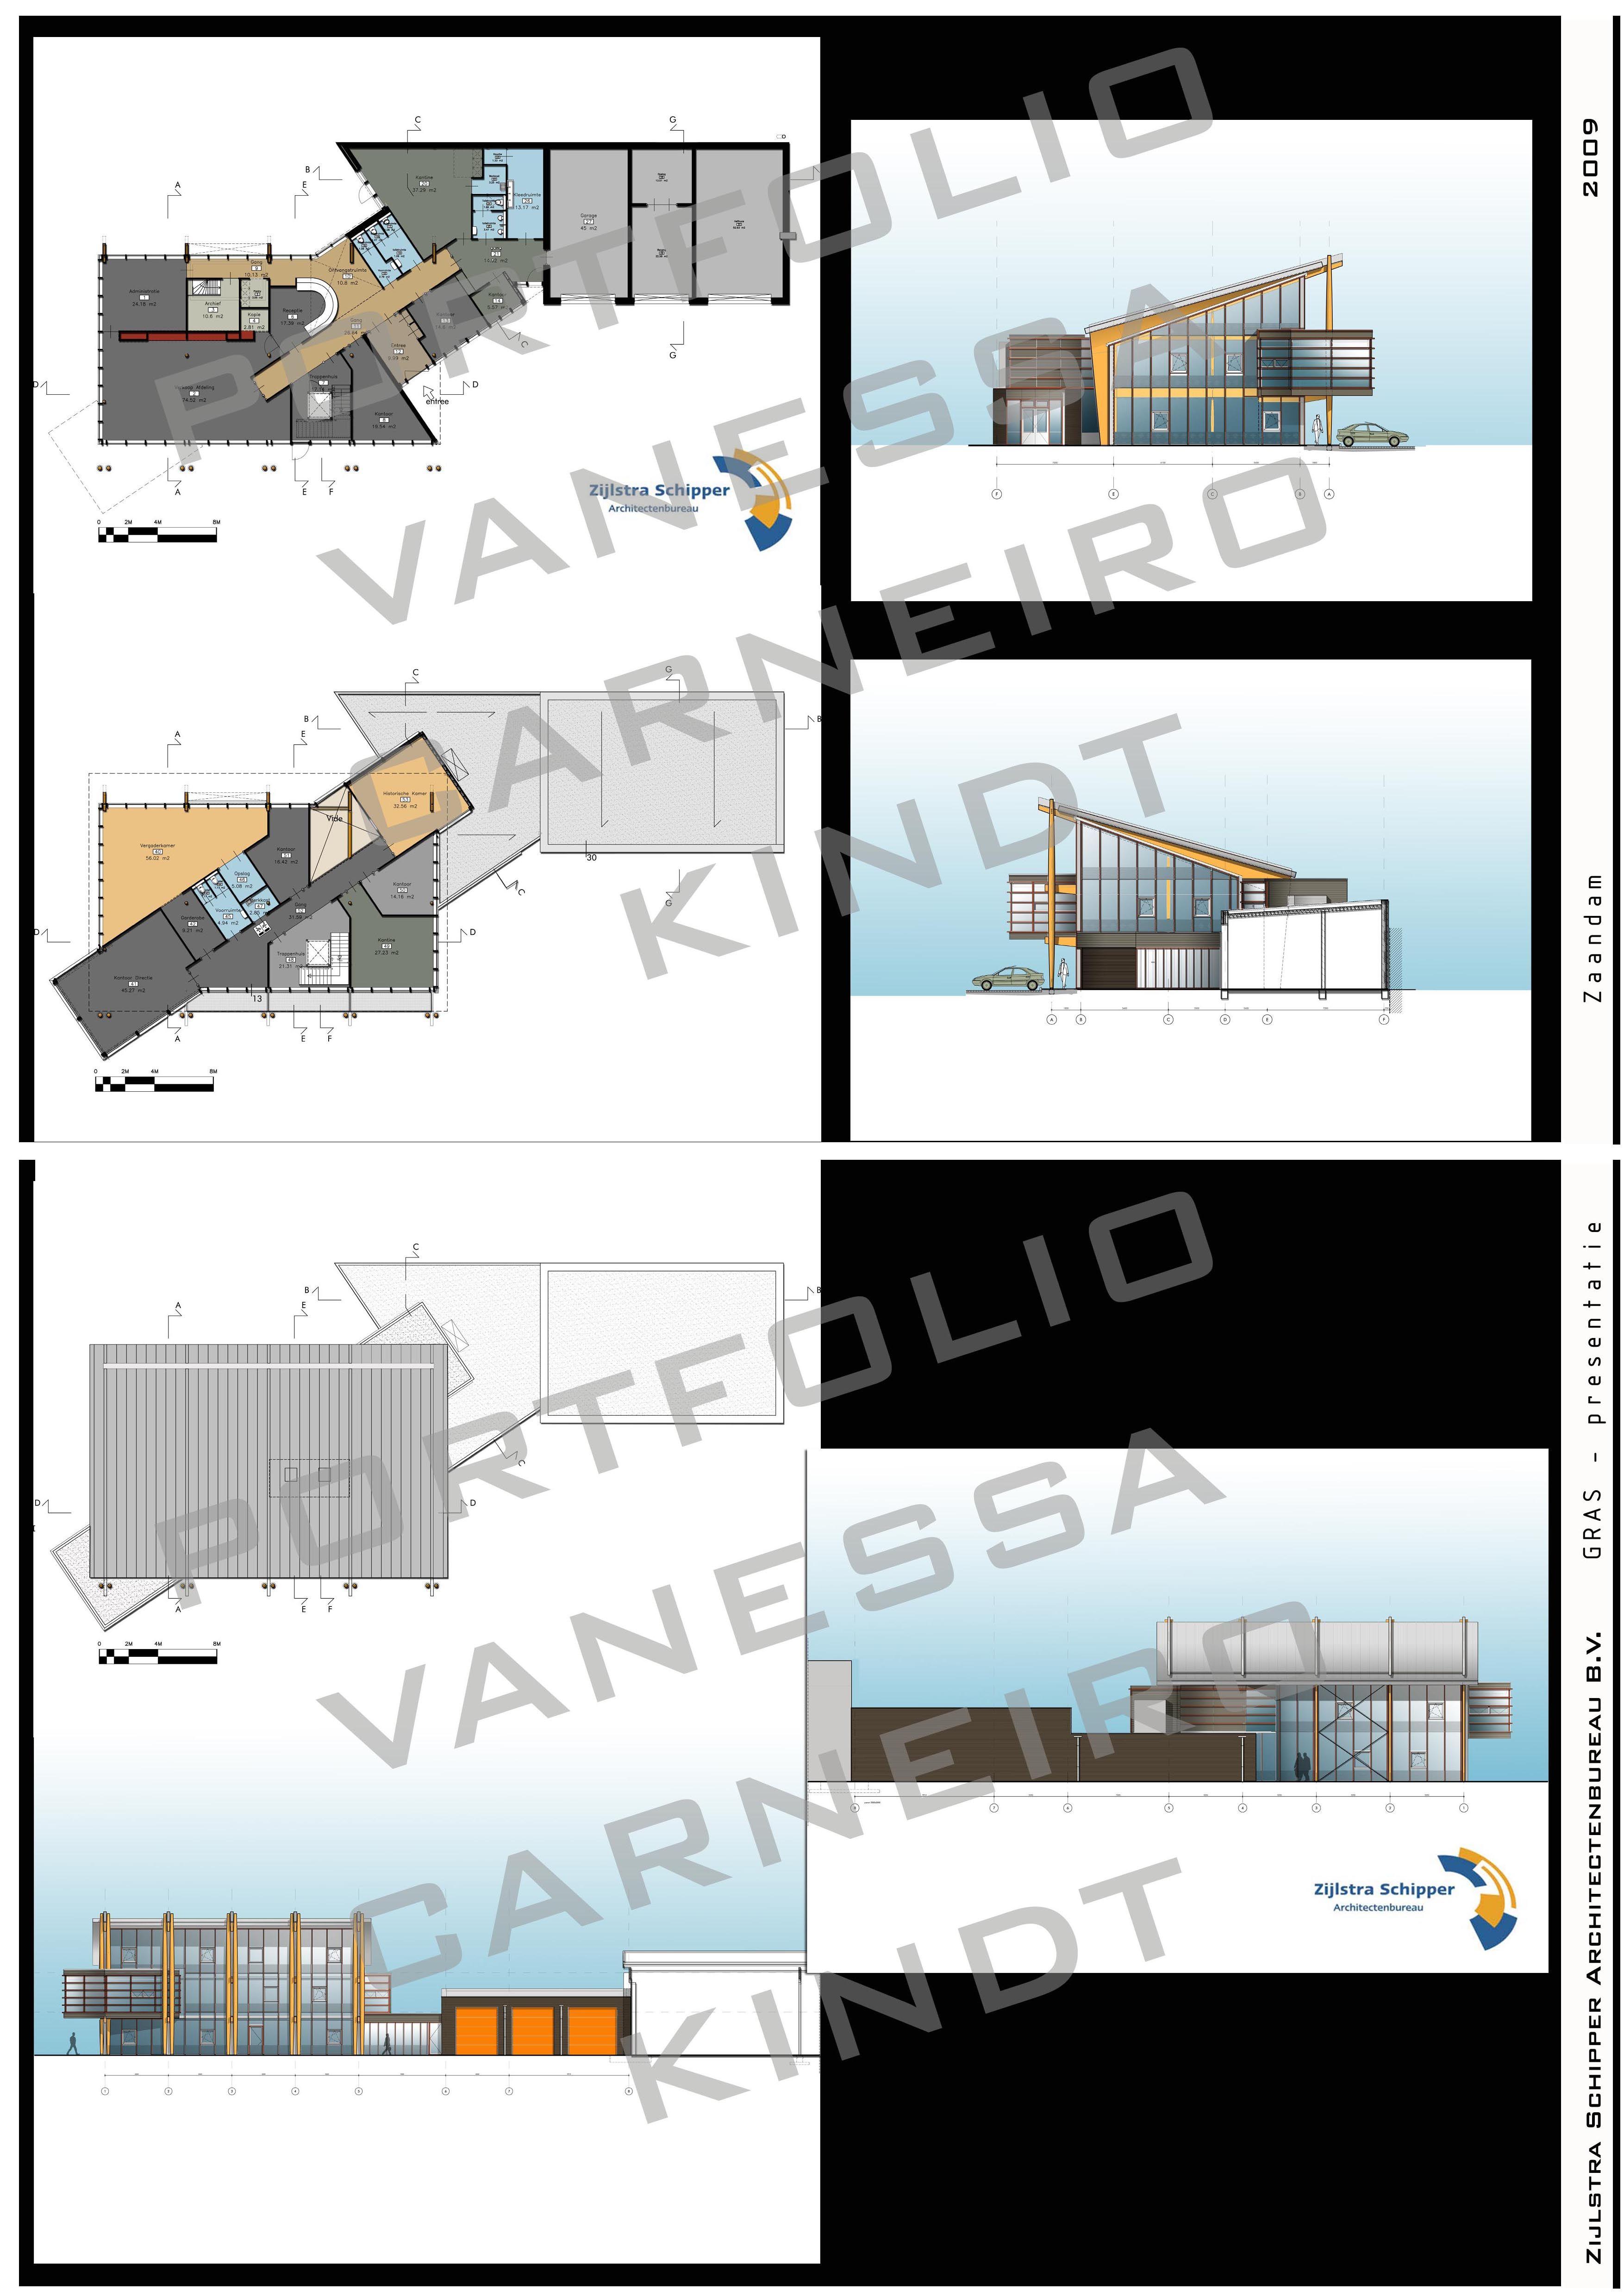 Zijlstra Schipper Architectenbureau BV - Presentatie en Impressie - Vanessa Carneiro Kindt http://vanessakindt.weebly.com/uploads/3/0/9/8/3098788/portifoliovck-zsagras.jpg